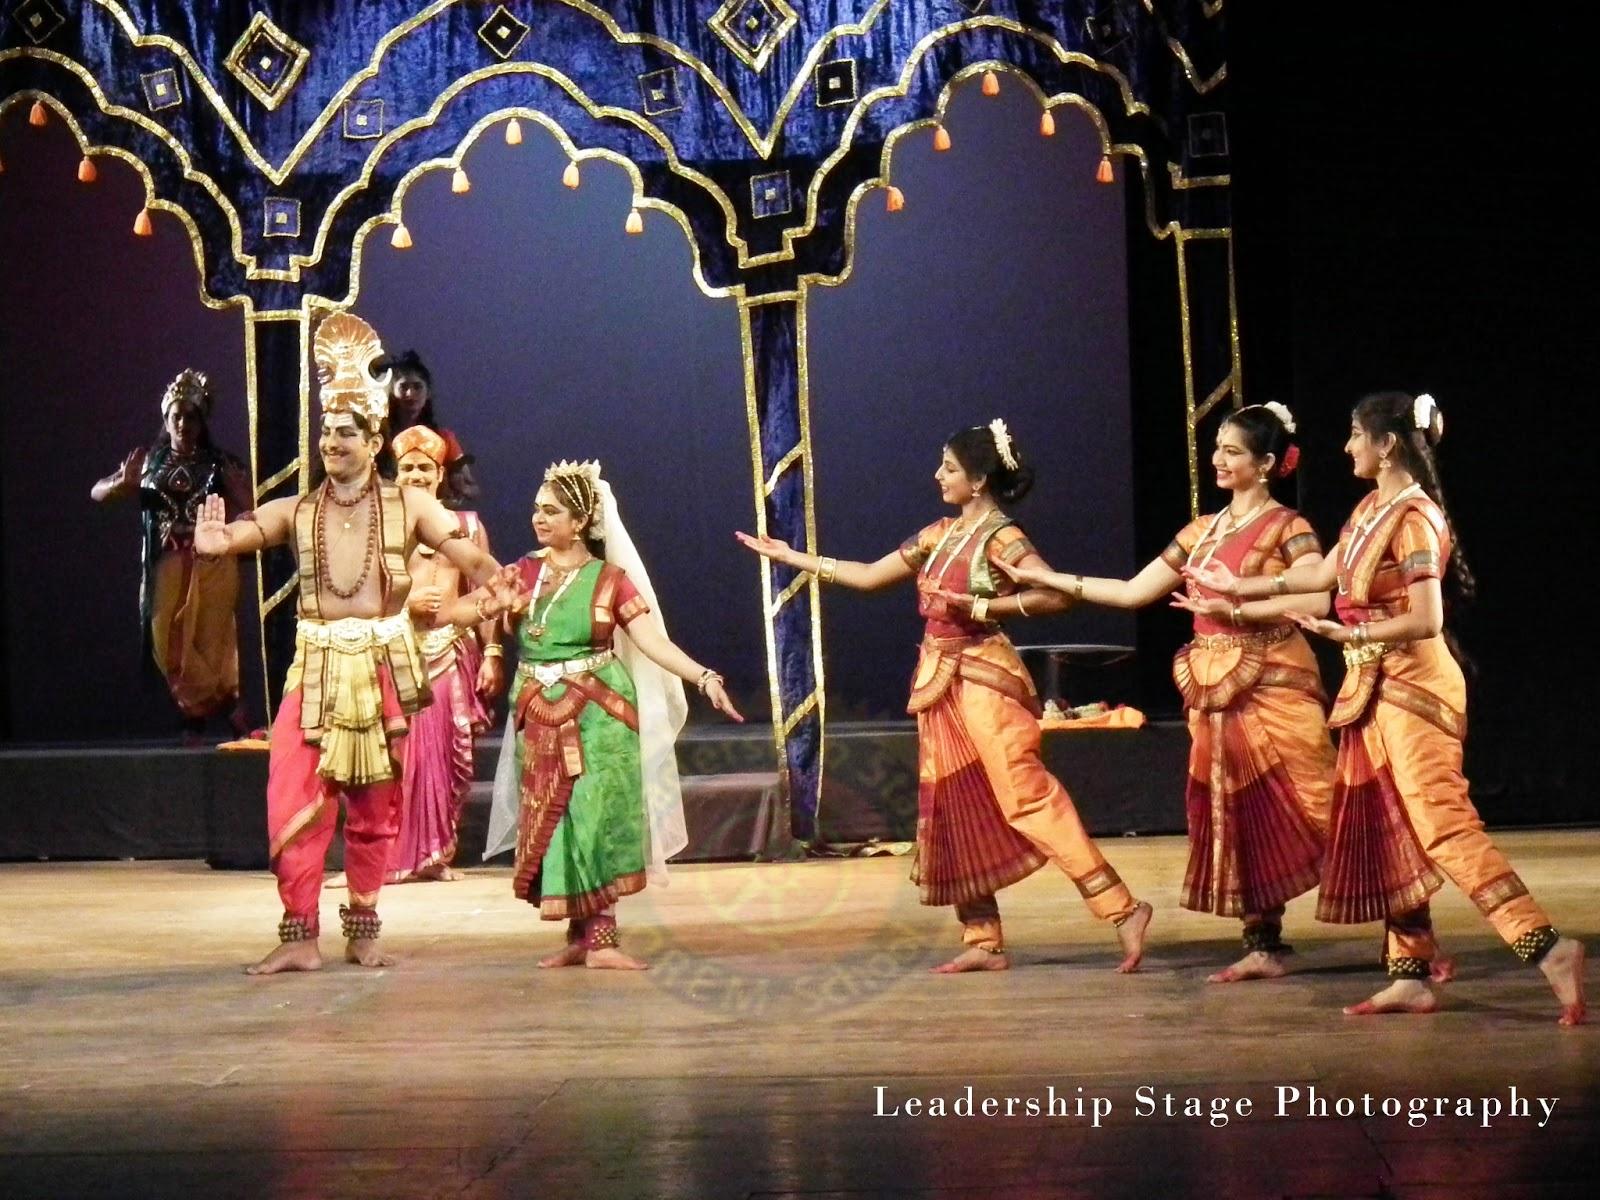 thiyagarajakumar ramaswamy u0026 39 s leadership stage india